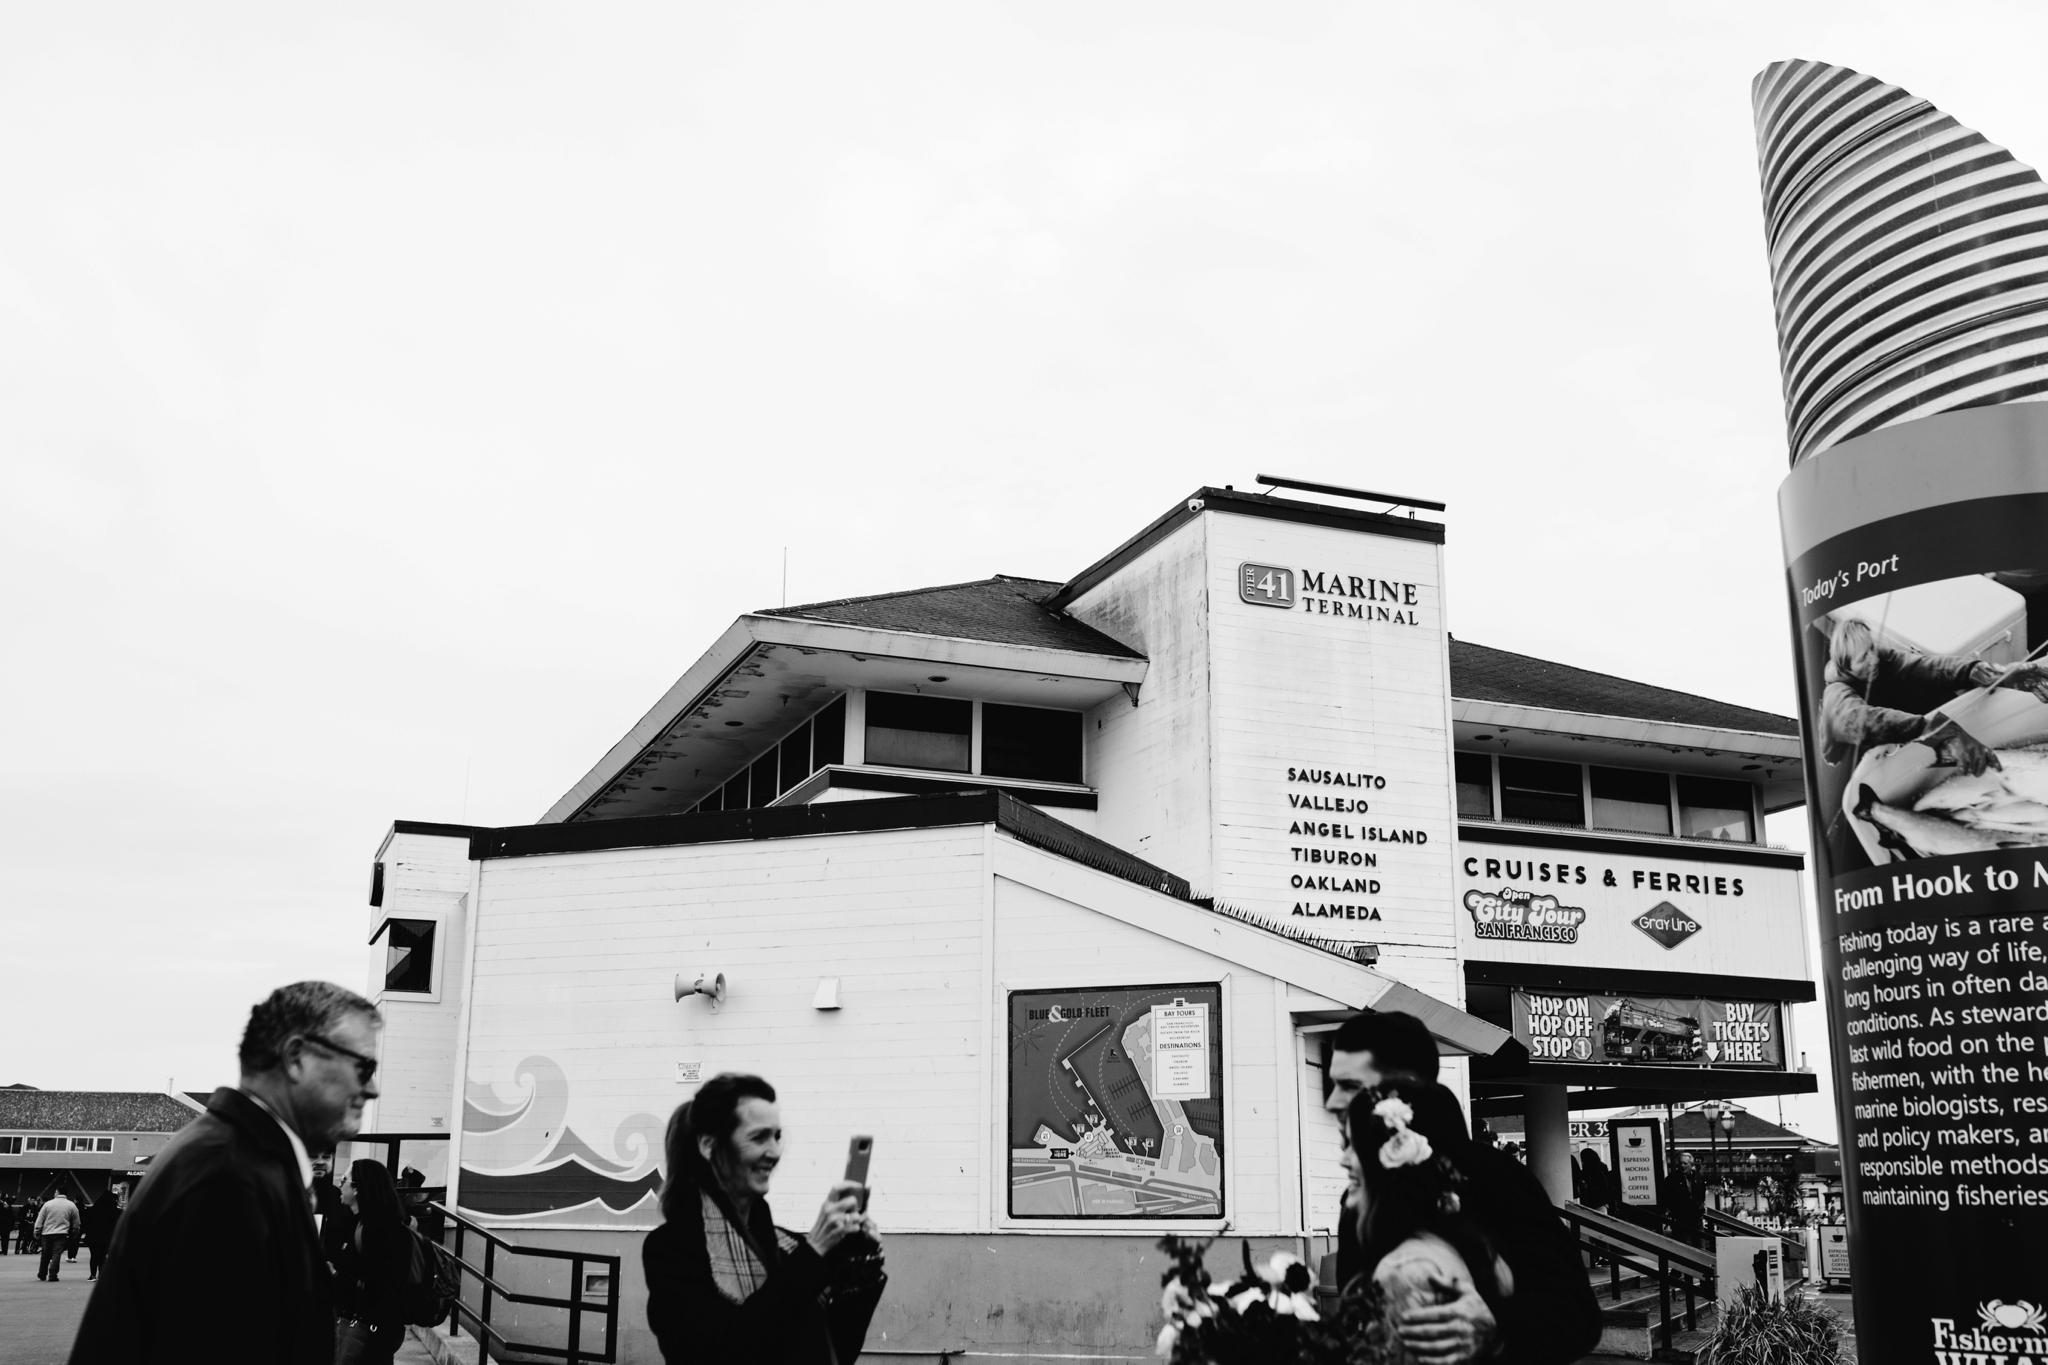 San Francisco Wedding photographer, Documentary style wedding photos, Bay Area wedding photographer, SF Bay Area wedding photography, Northern California wedding photographer, California destination wedding photographer, California destination wedding, Intimate wedding in California, Angel Island wedding photos, SF elopement photographer, California elopement, Los Angeles wedding photographer, Destination wedding photographer f